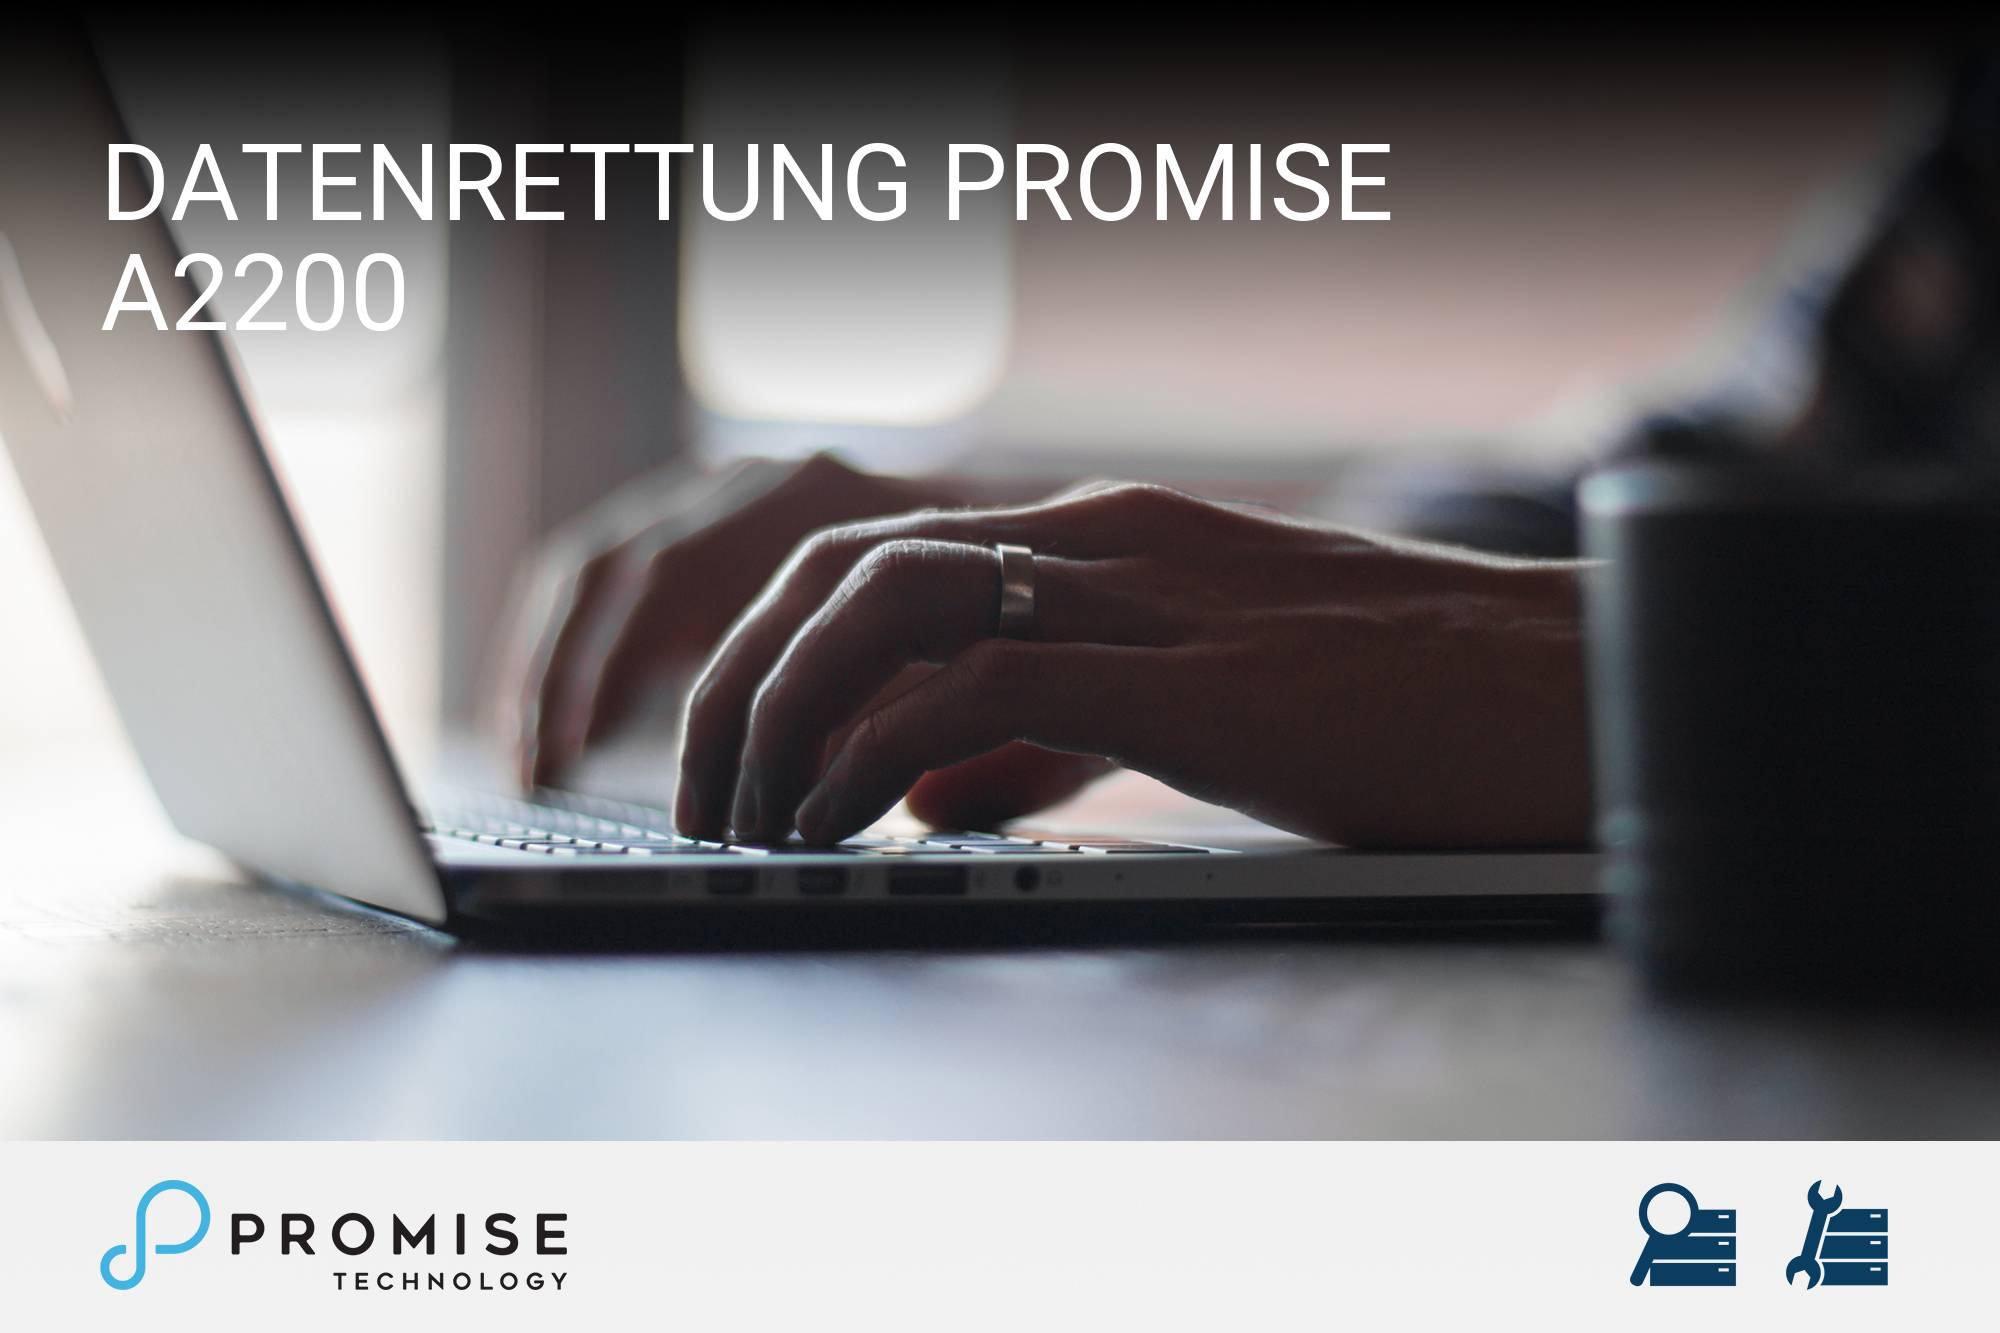 Promise A2200